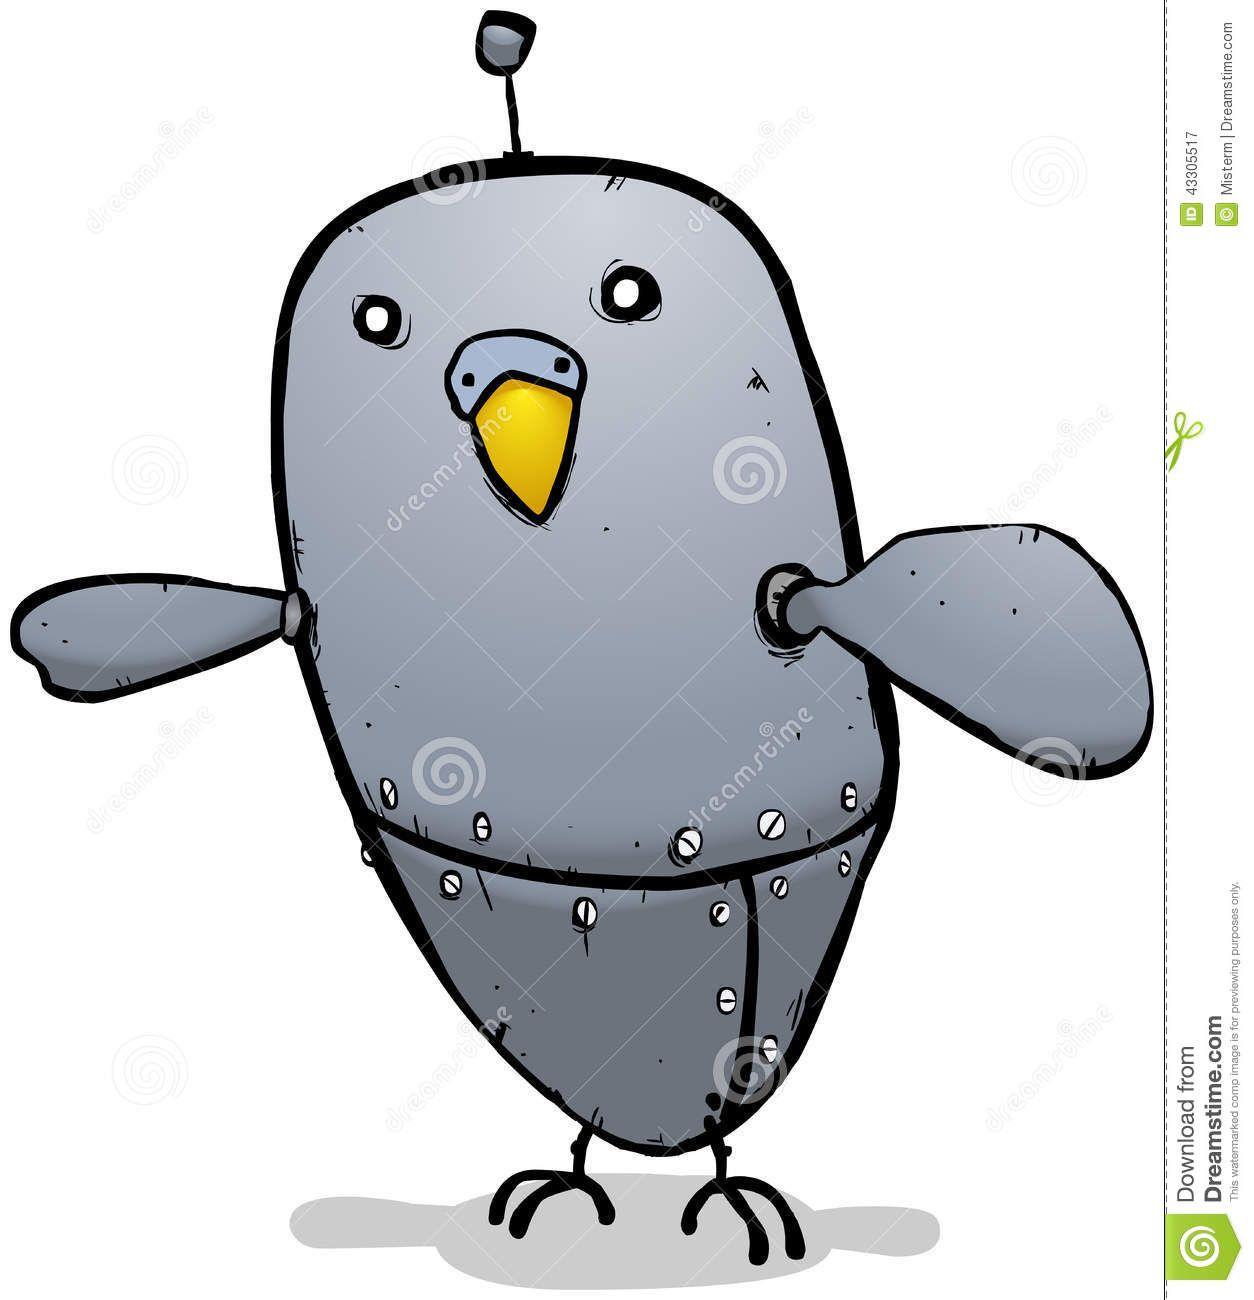 budgie cartoon characters google search cartoon birds